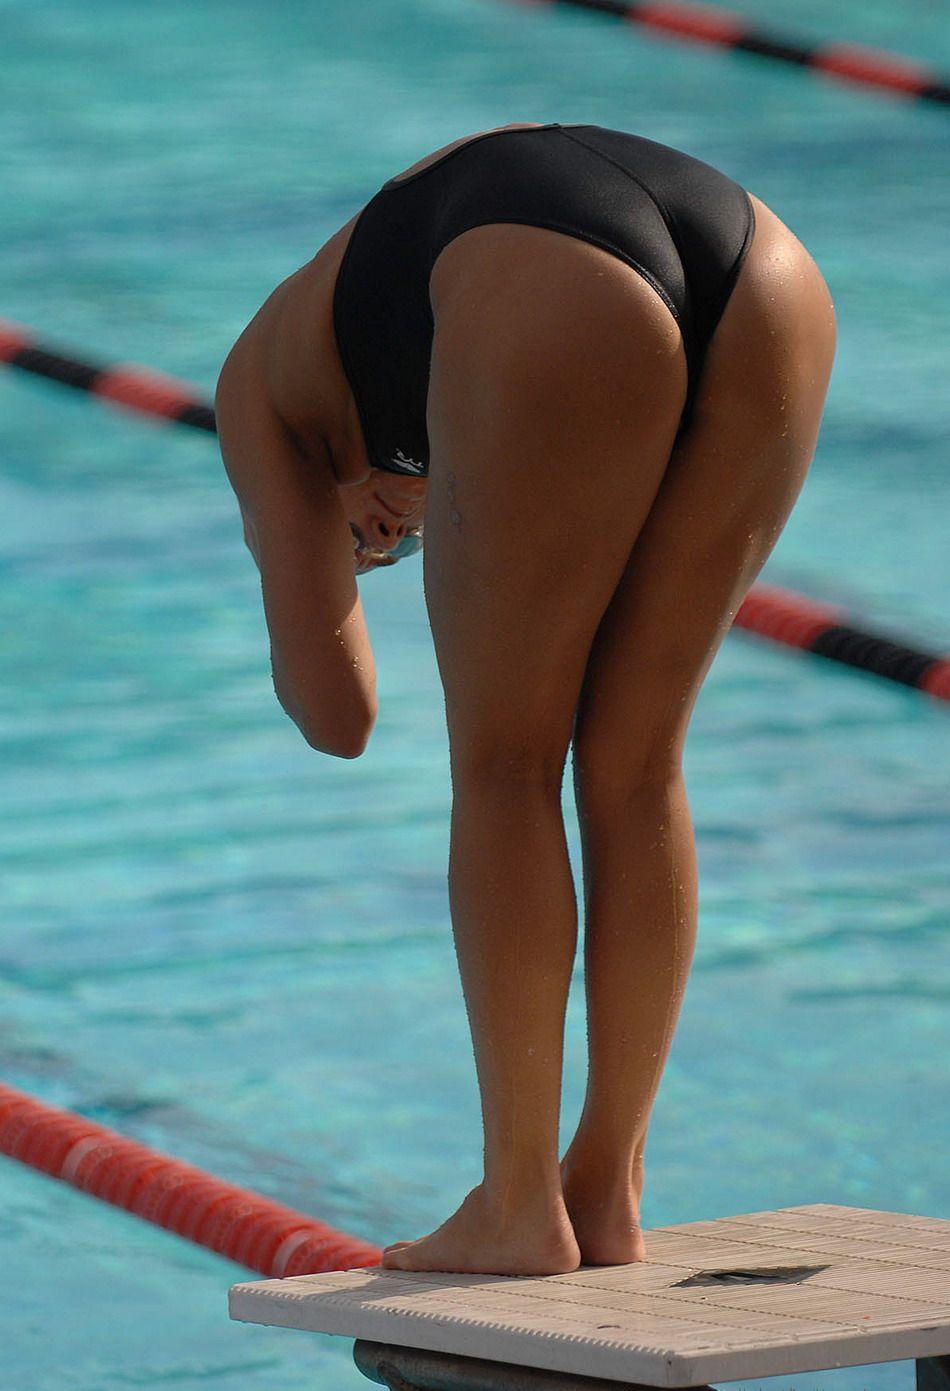 High school swimmer disqualified because ref saw butt cheek touching butt cheek